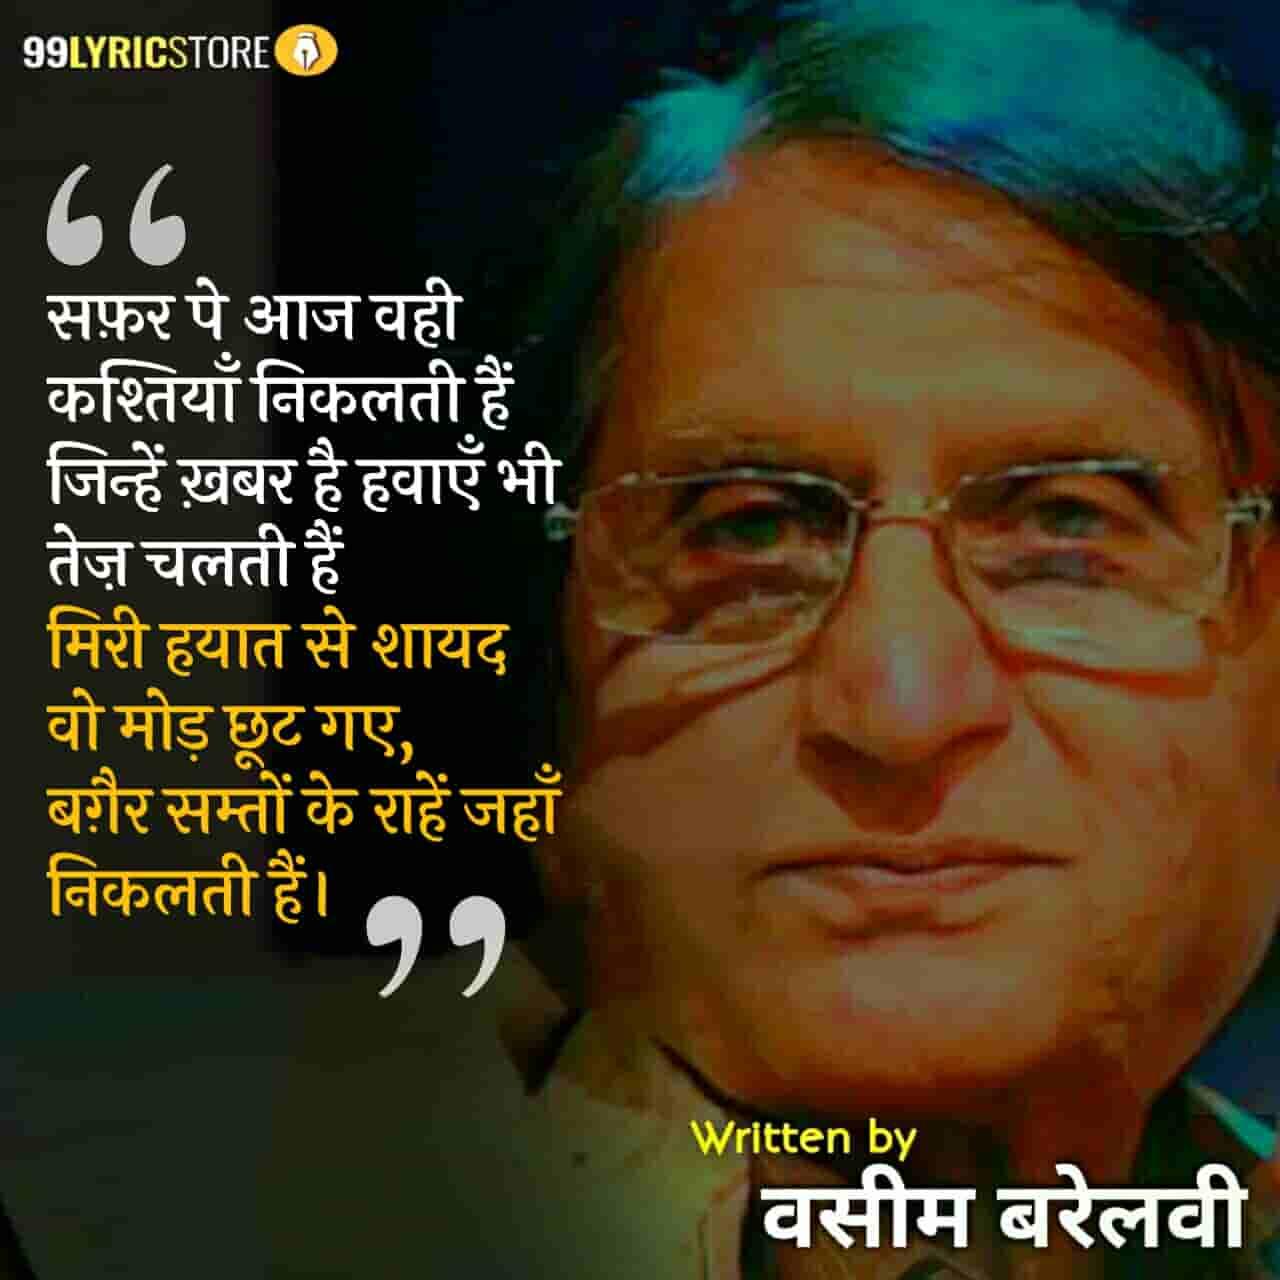 This beautiful ghazal 'Safar Pe Aaj Wahi Kashtiyan Nikalti Hain' has written by Waseem Barelvi.